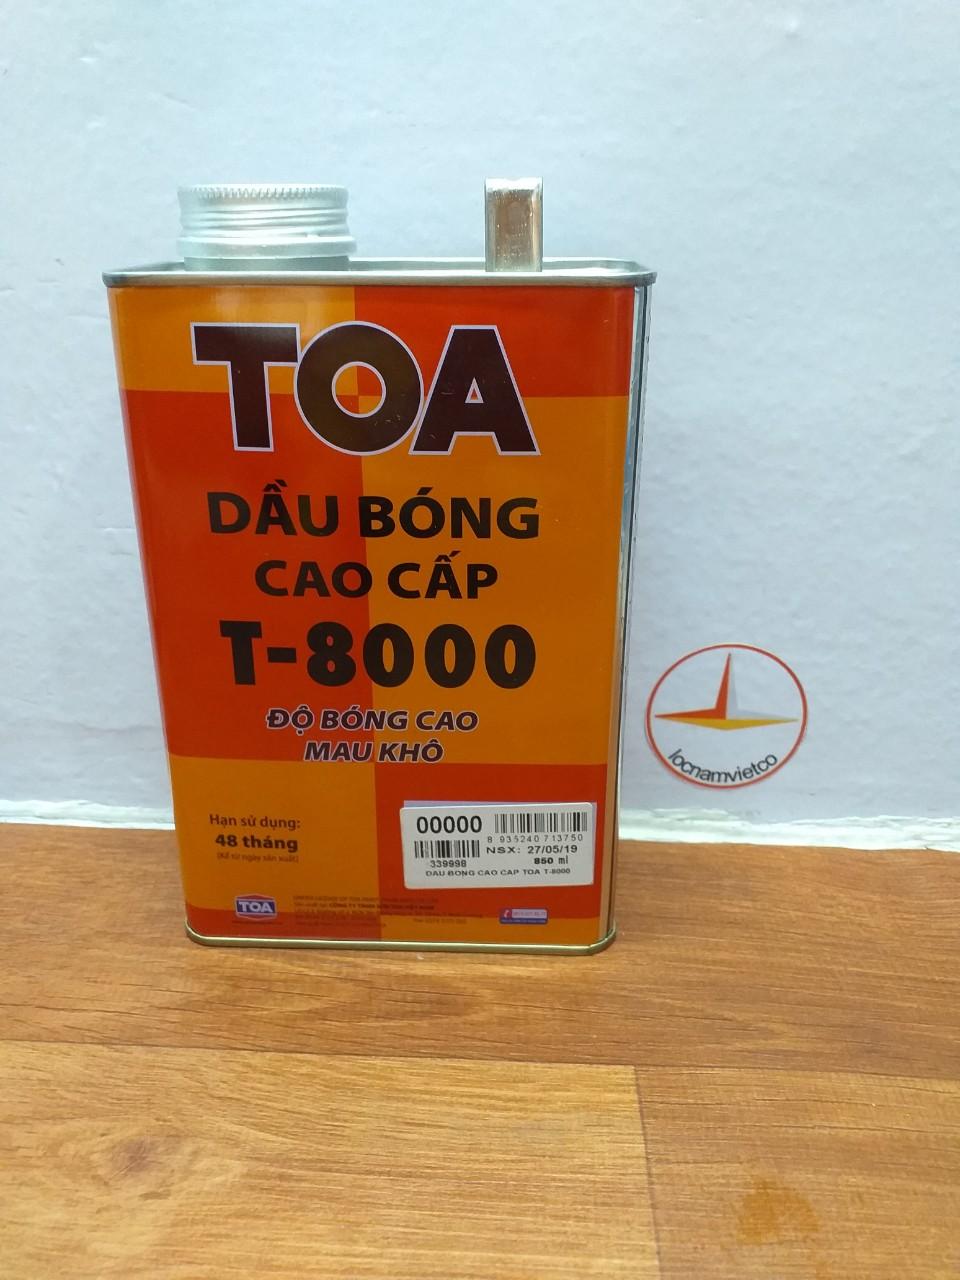 DAU BONG CHO GO TOA T 8000 VARNISH (3)